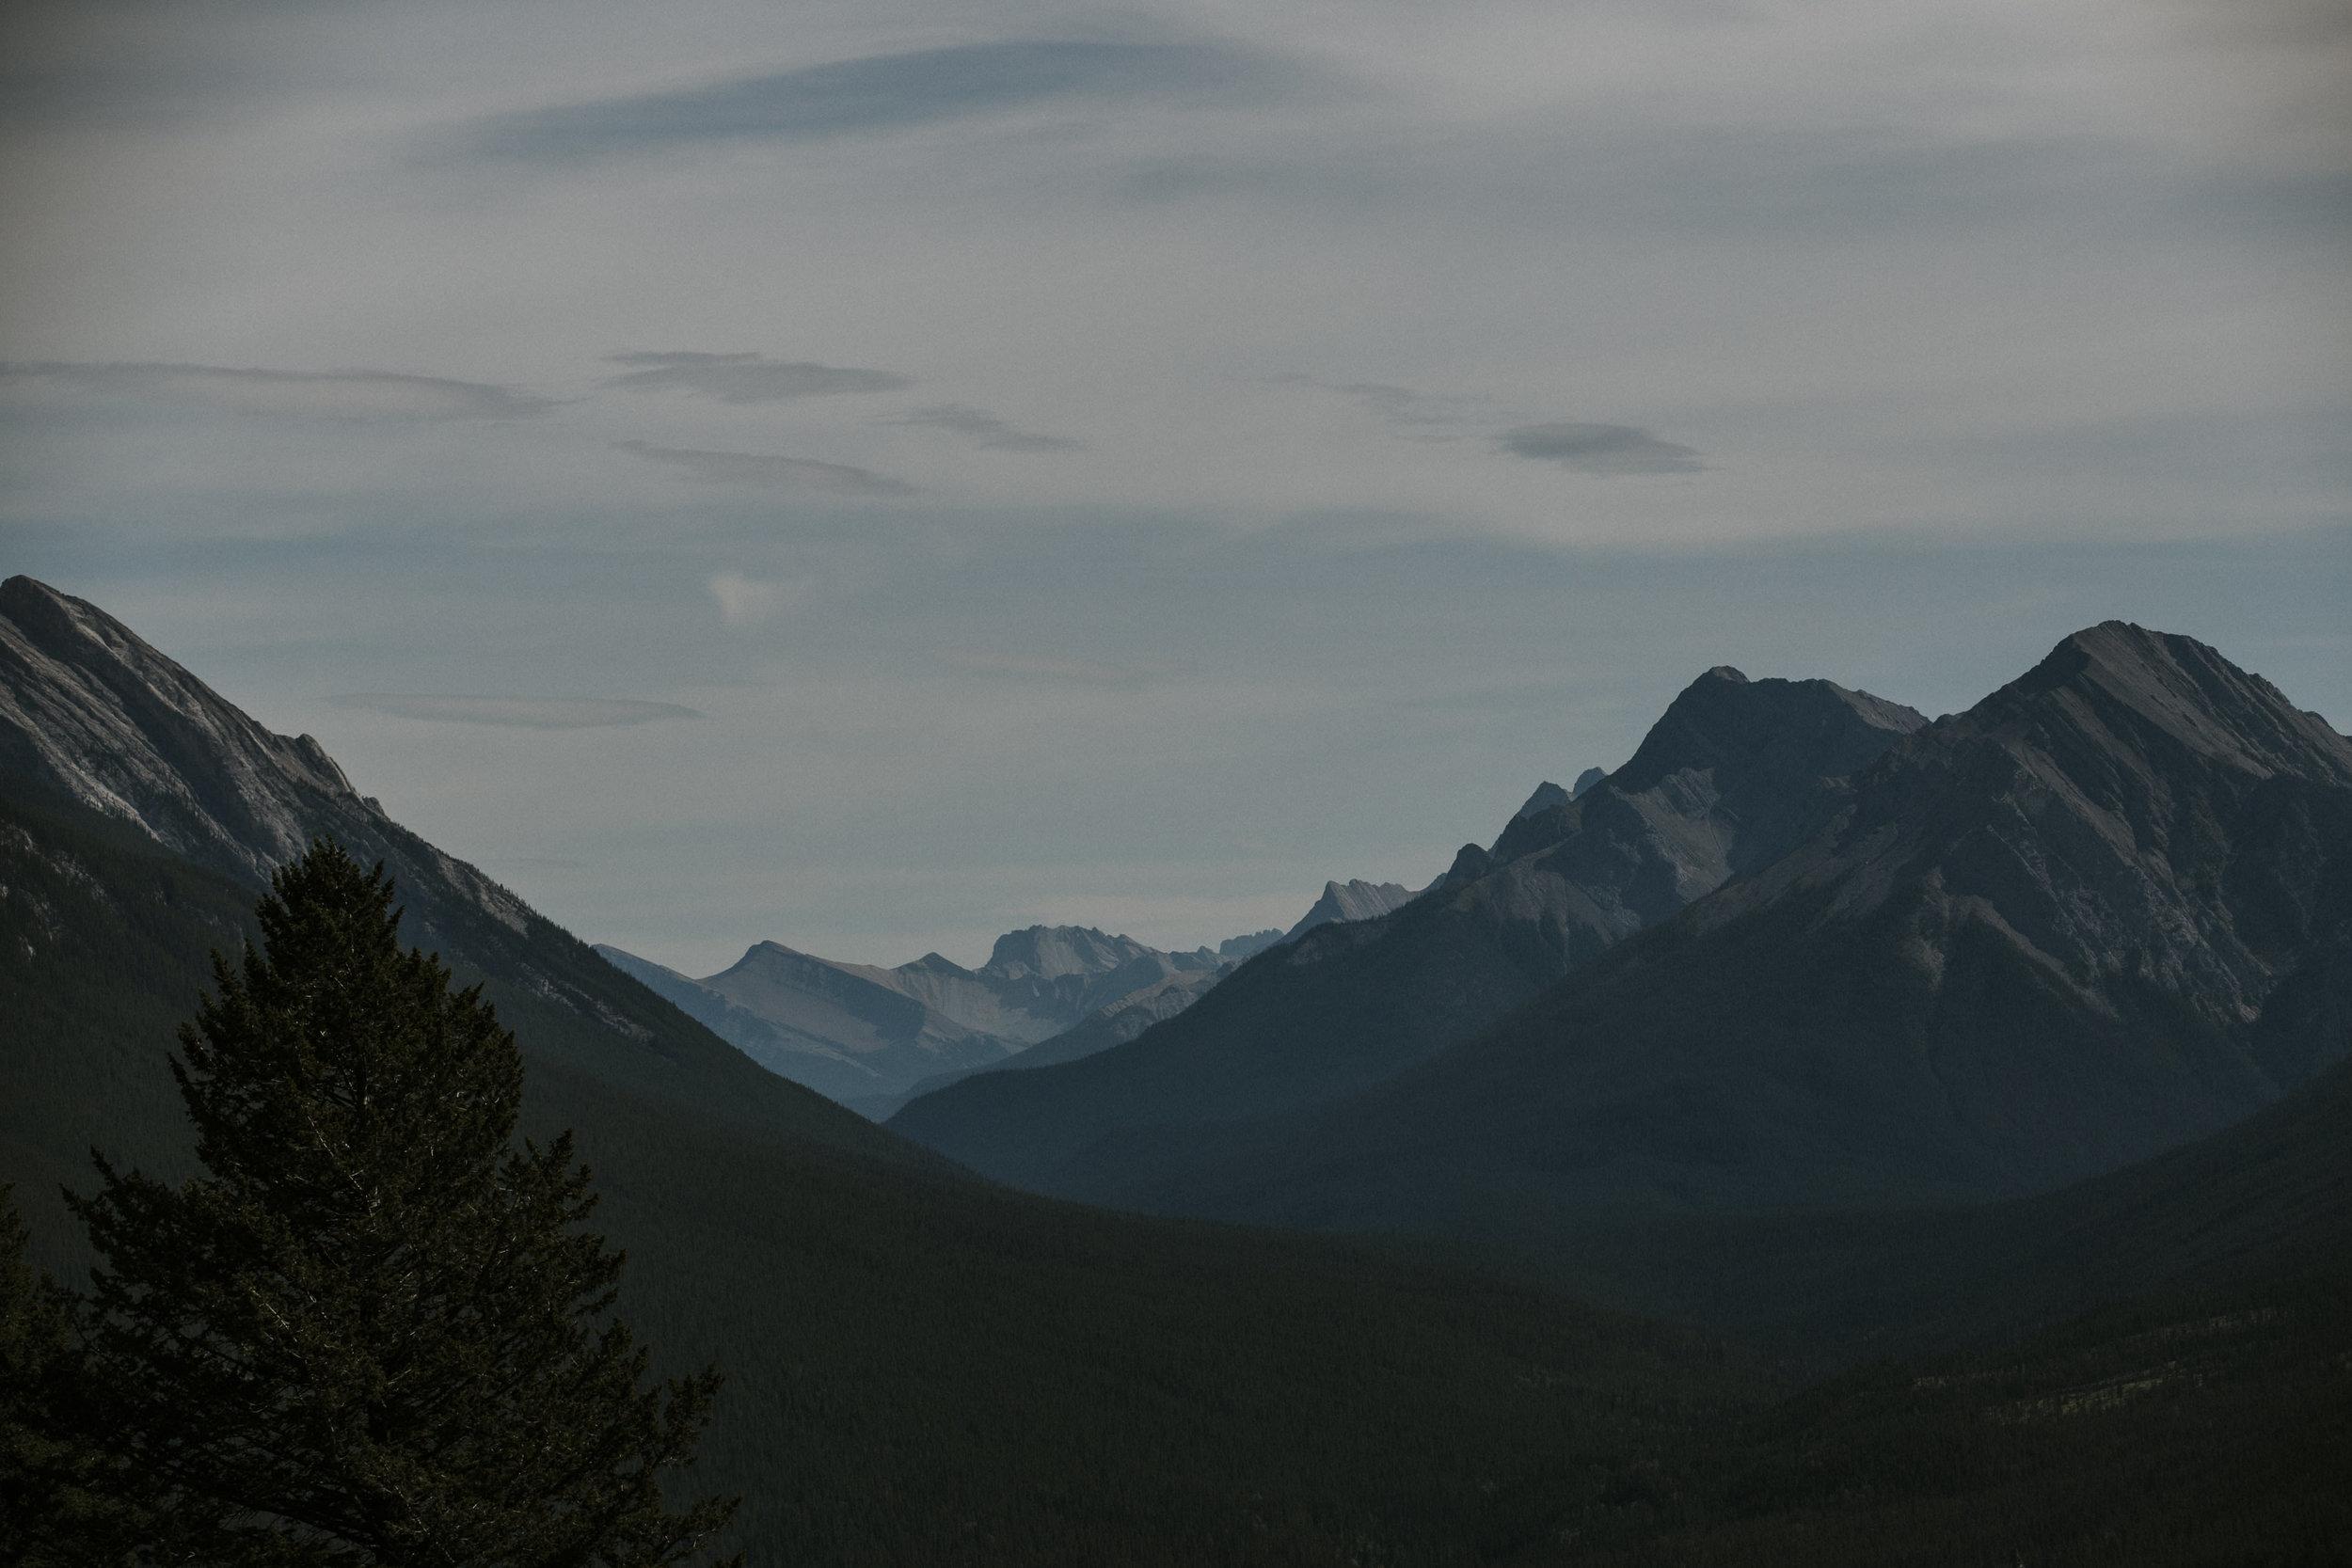 rugged rocky mountain landscape